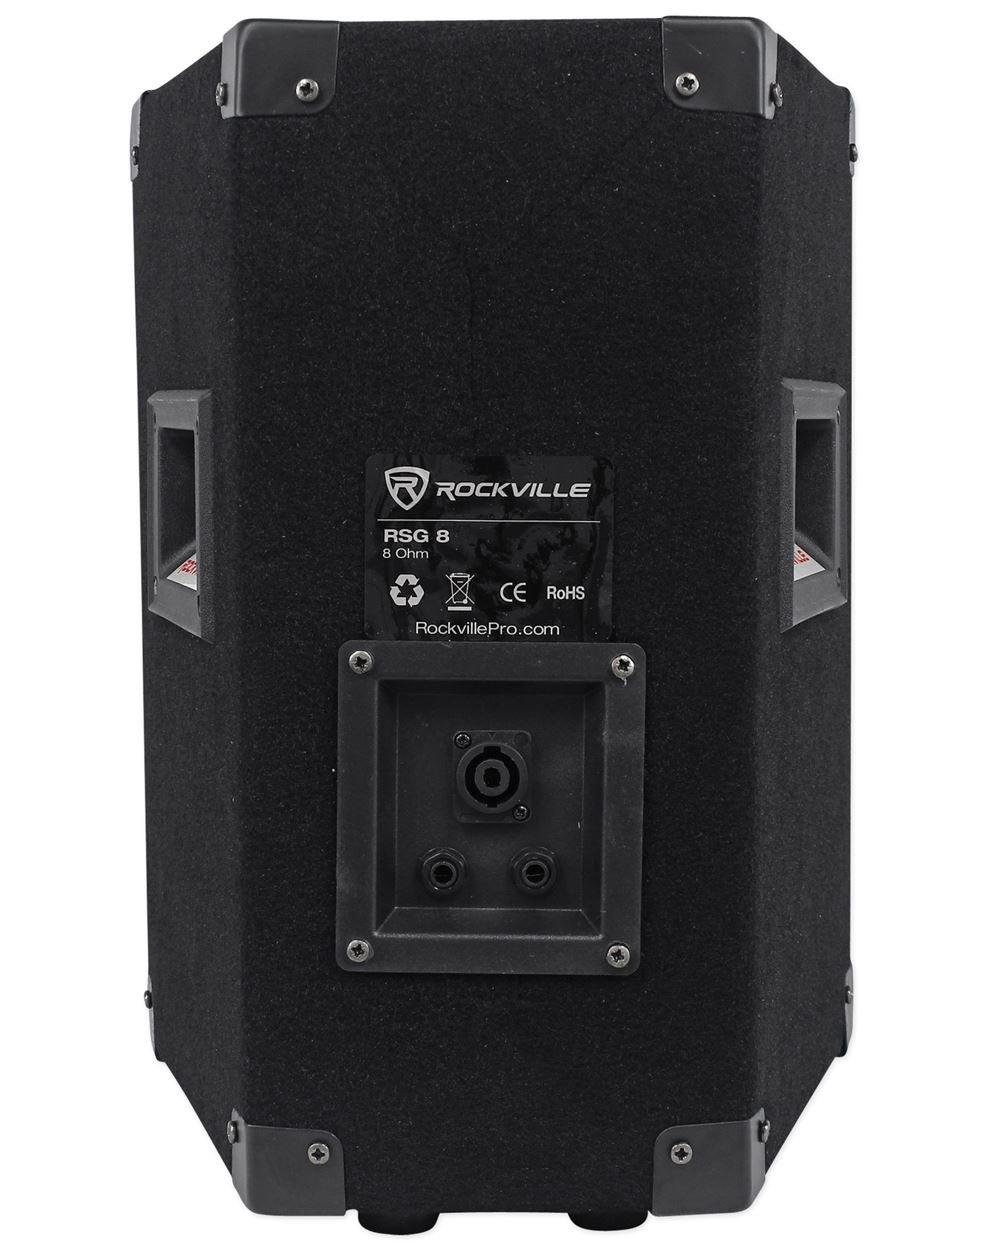 Rockville RSG10 10 400 Watt 8-Ohm 2-Way Passive DJ//Pro PA Speaker